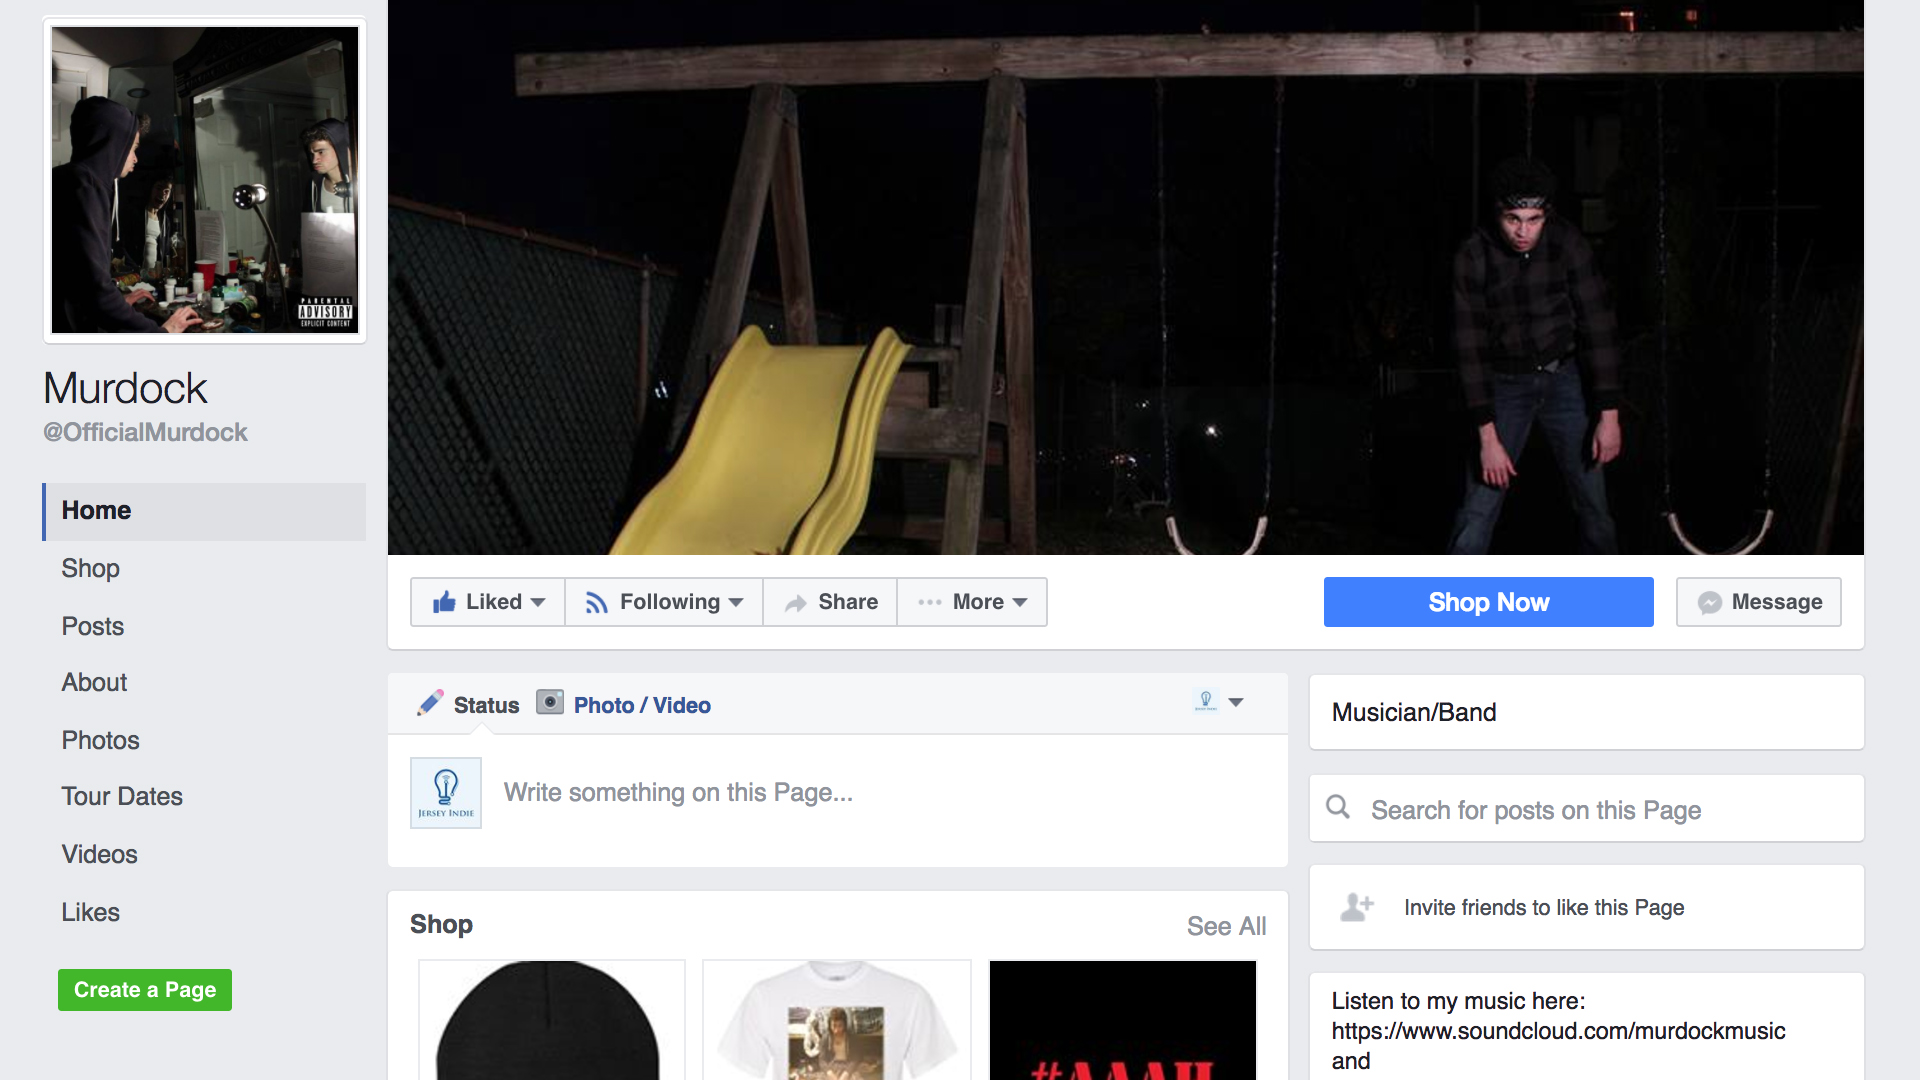 Facebook.com/OfficialMurdock